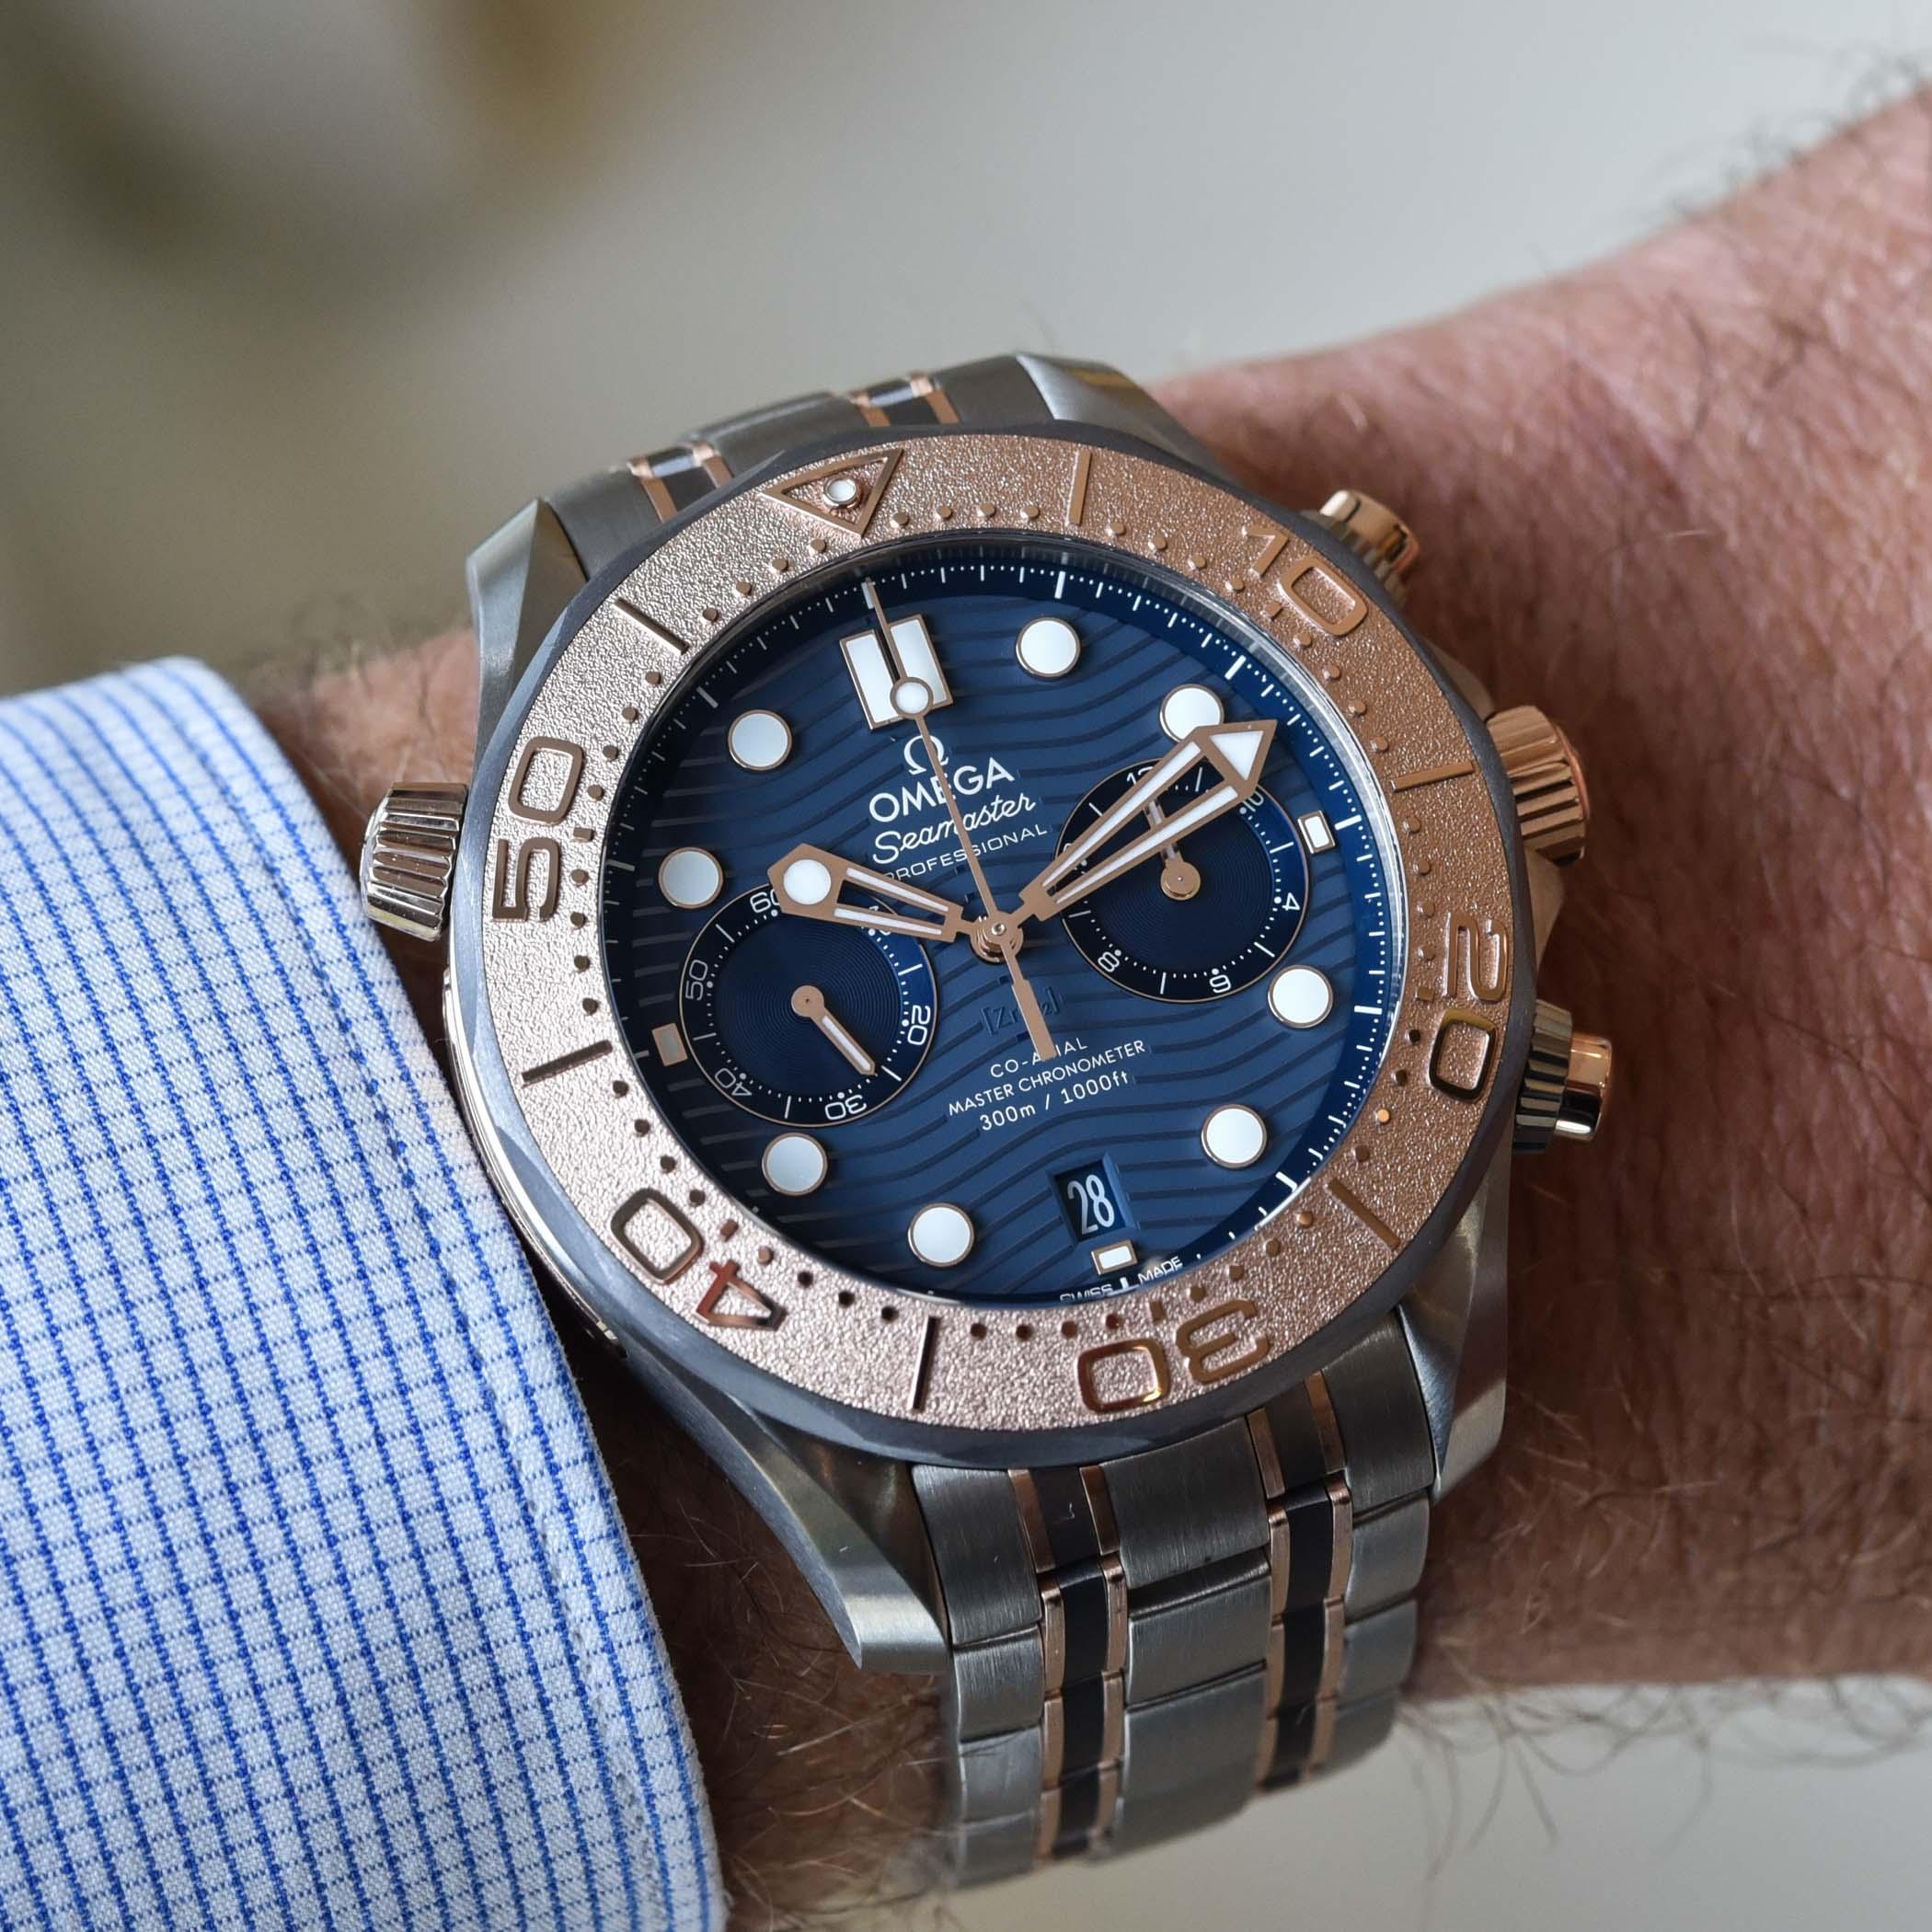 Omega Seamaster Diver 300M Chronograph tri-metal Titanium Tantalum Gold - 3